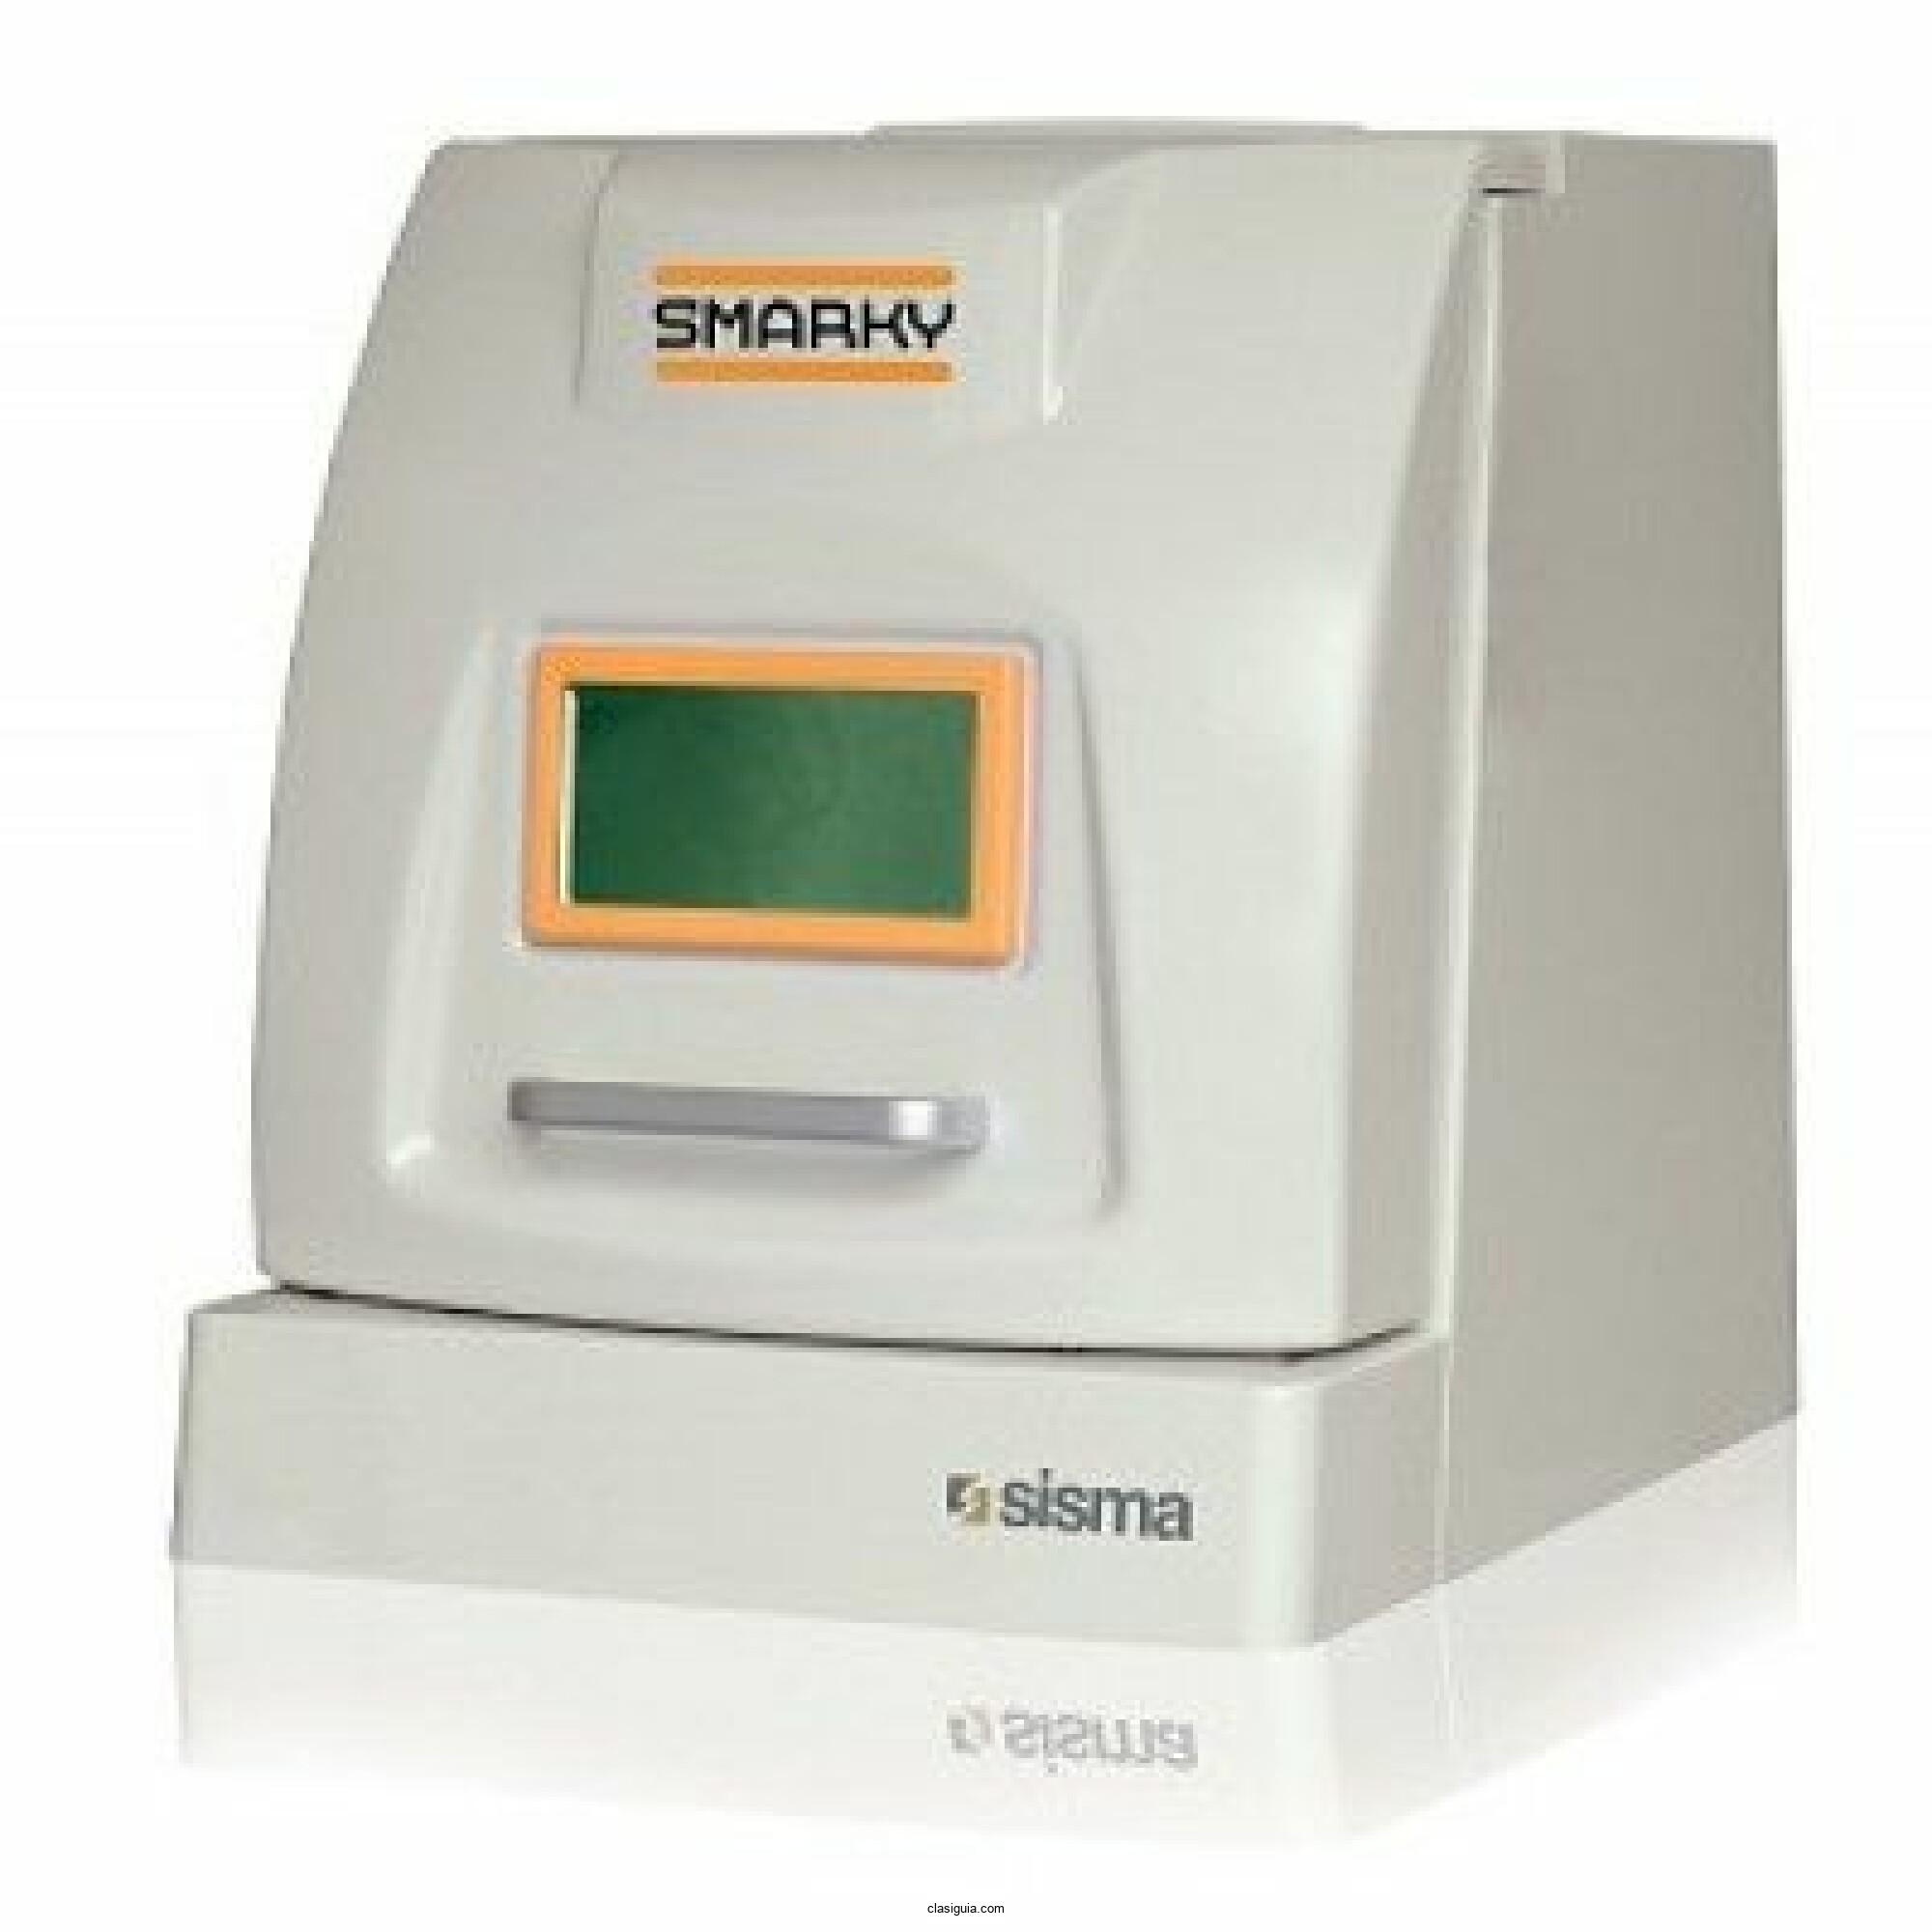 Sisma Smarky YAG Laser (MITRA PRINT)